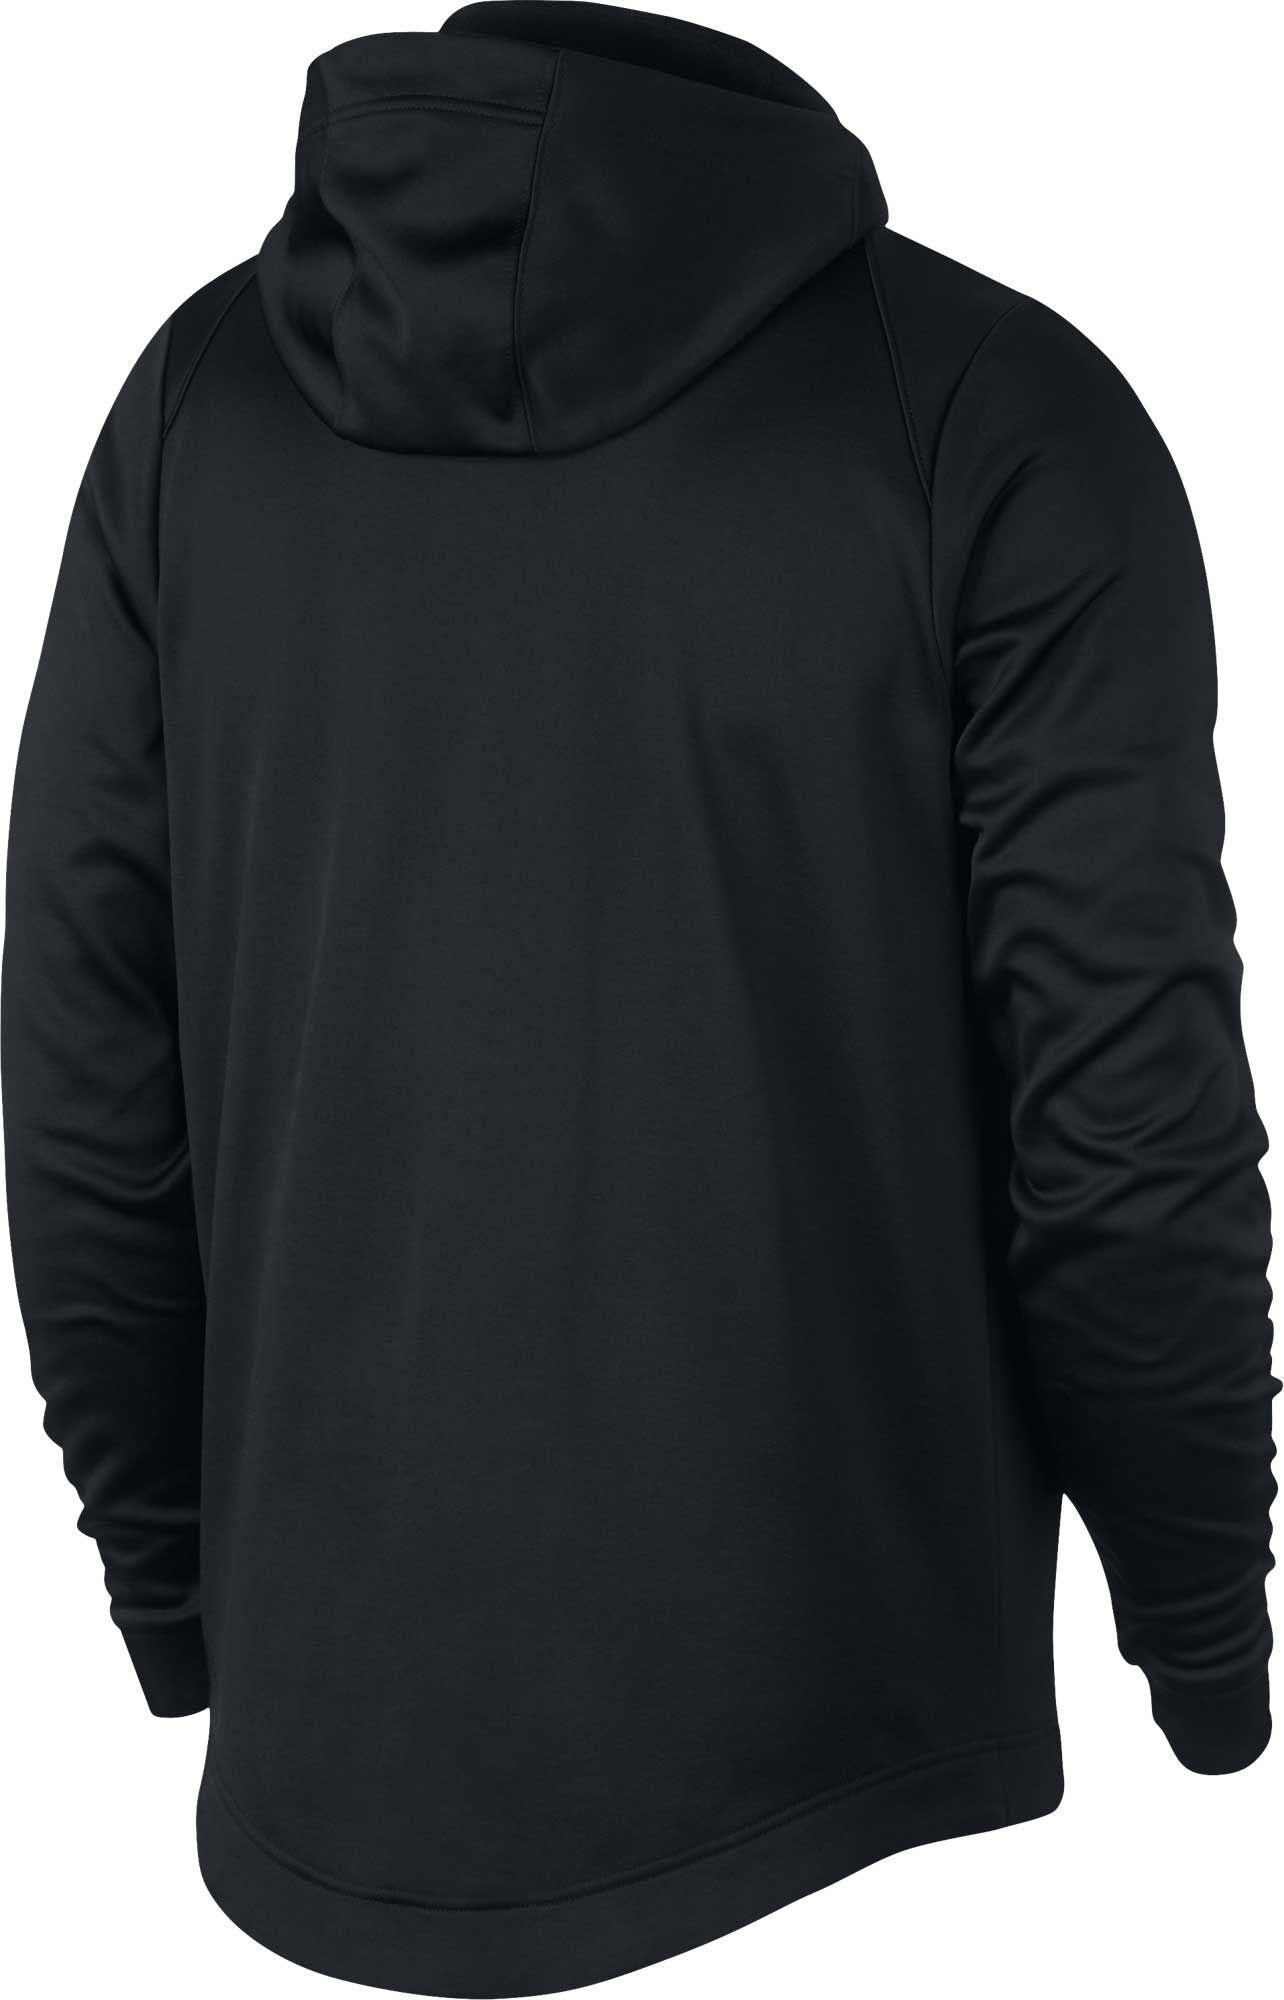 Nike Synthetic Lebron James Lebron Hoodie in Black ...